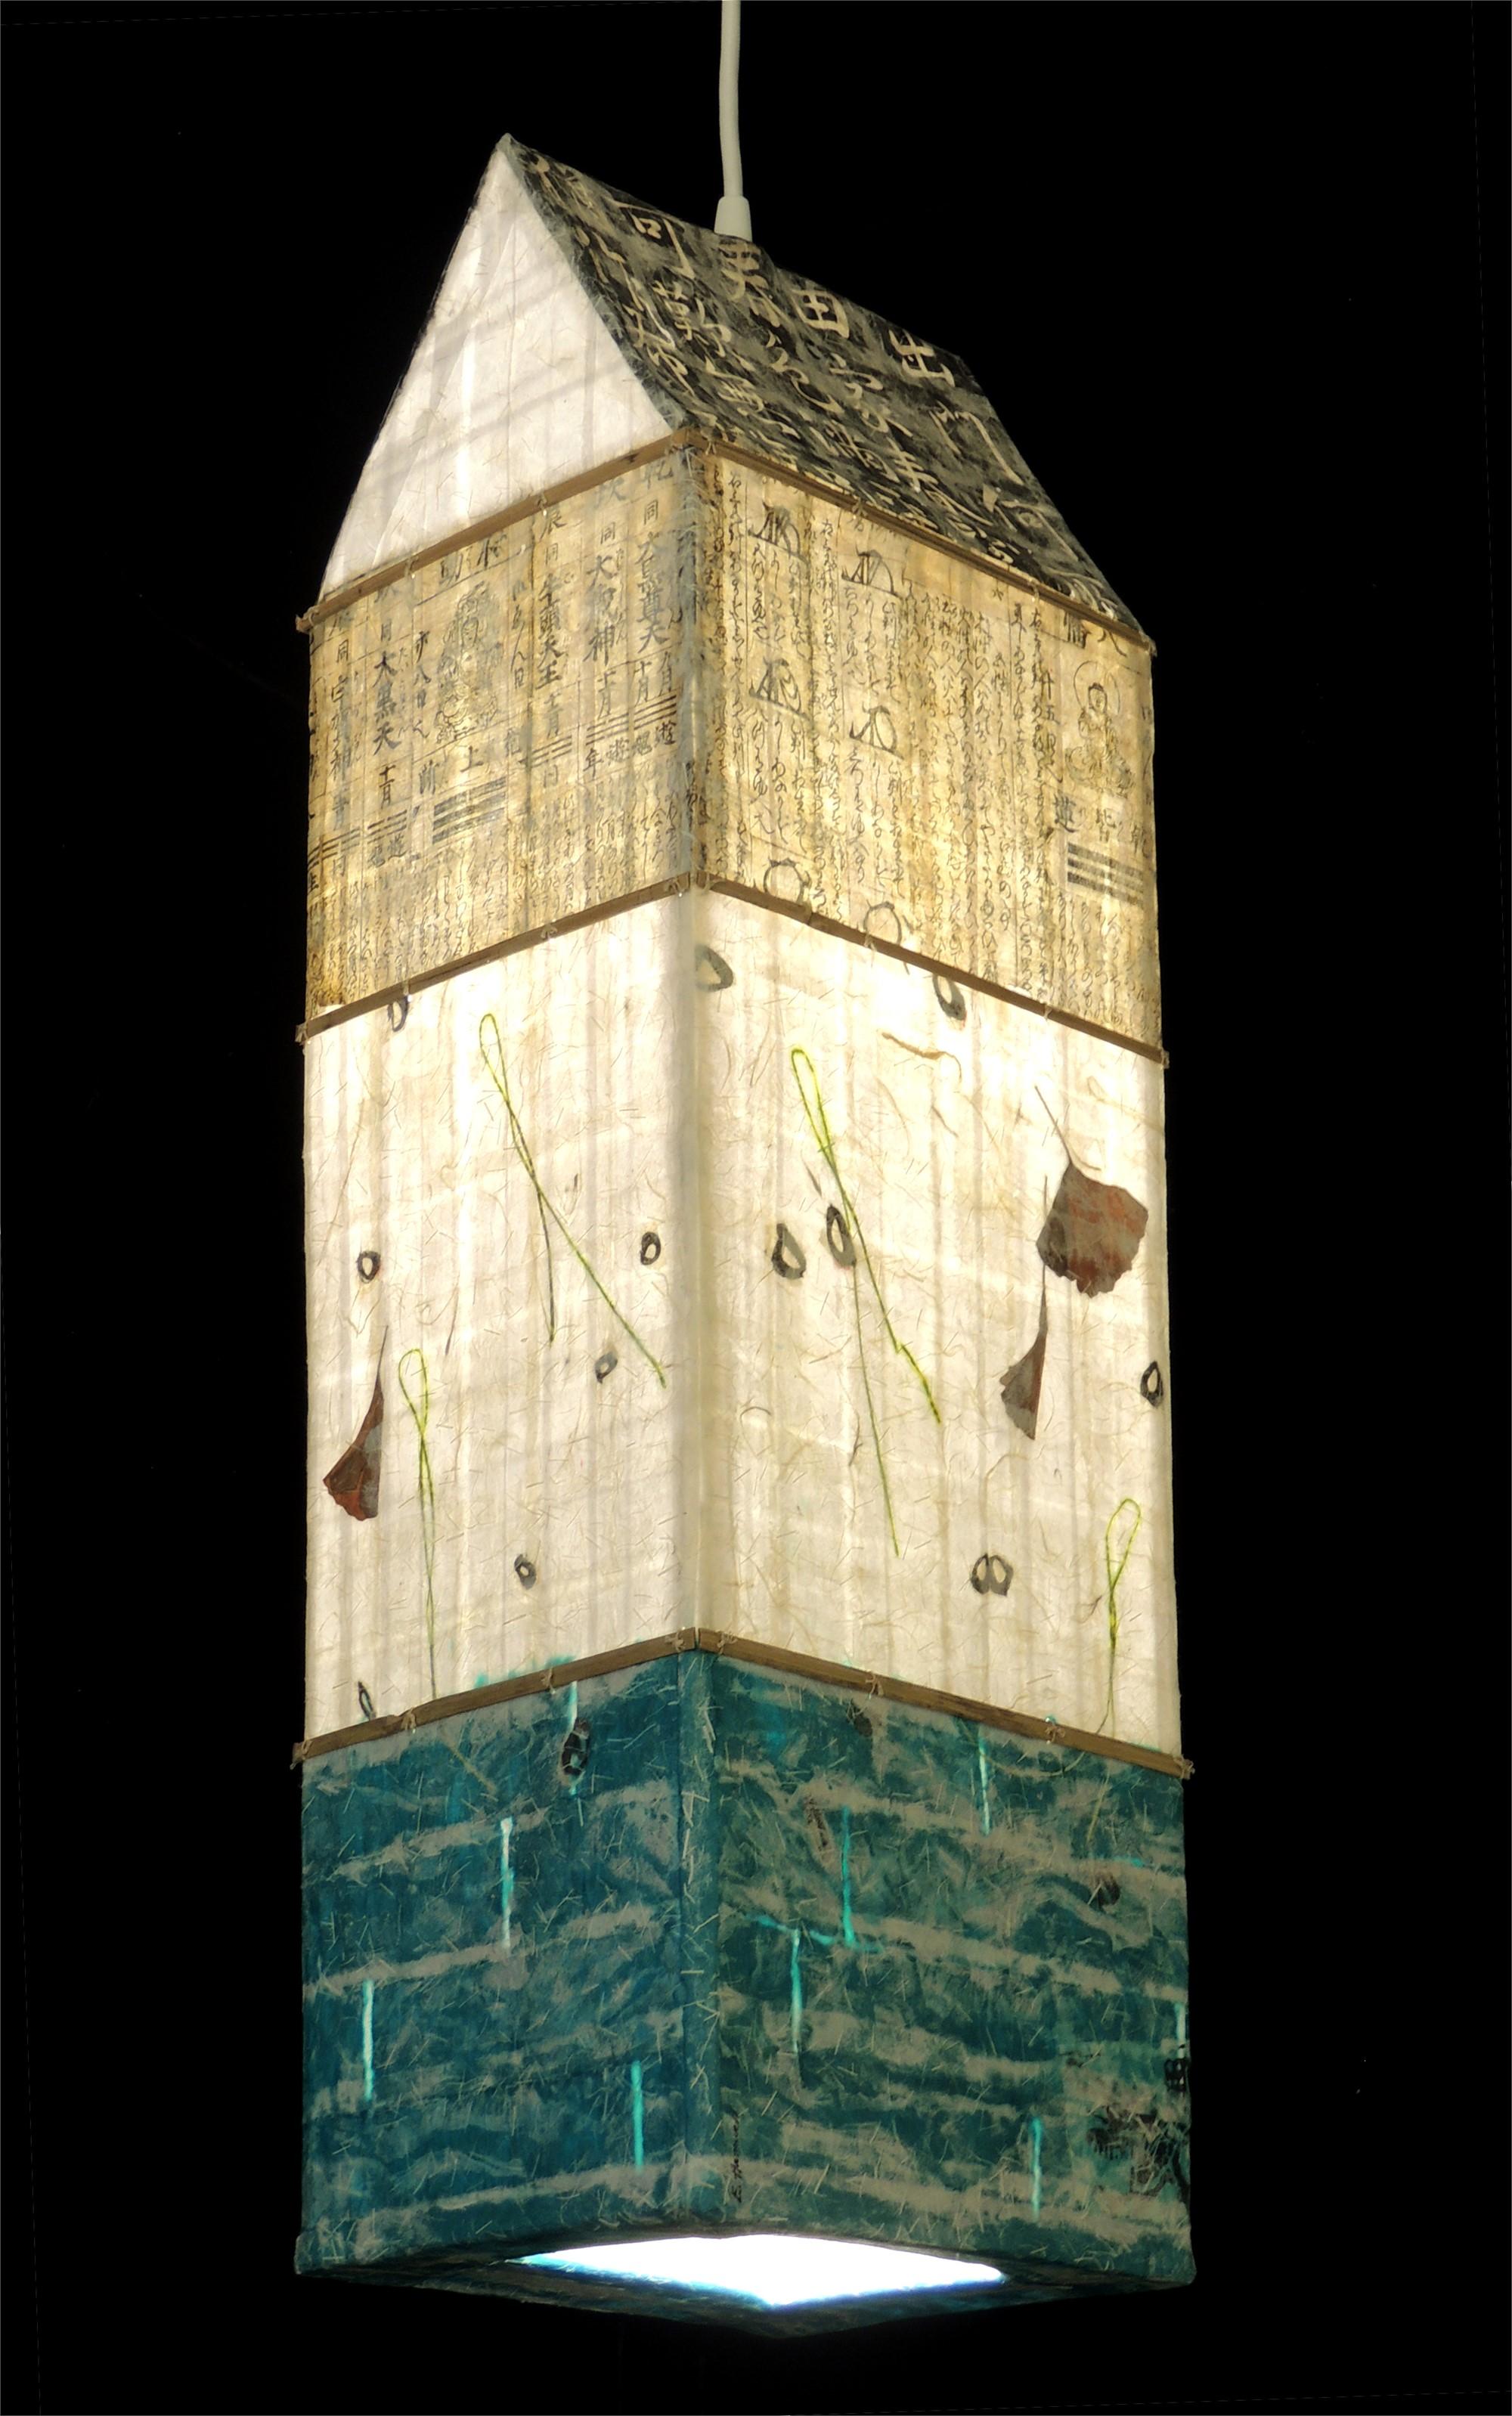 Gingko Water Spirit House Lantern by Elaine Hanowell